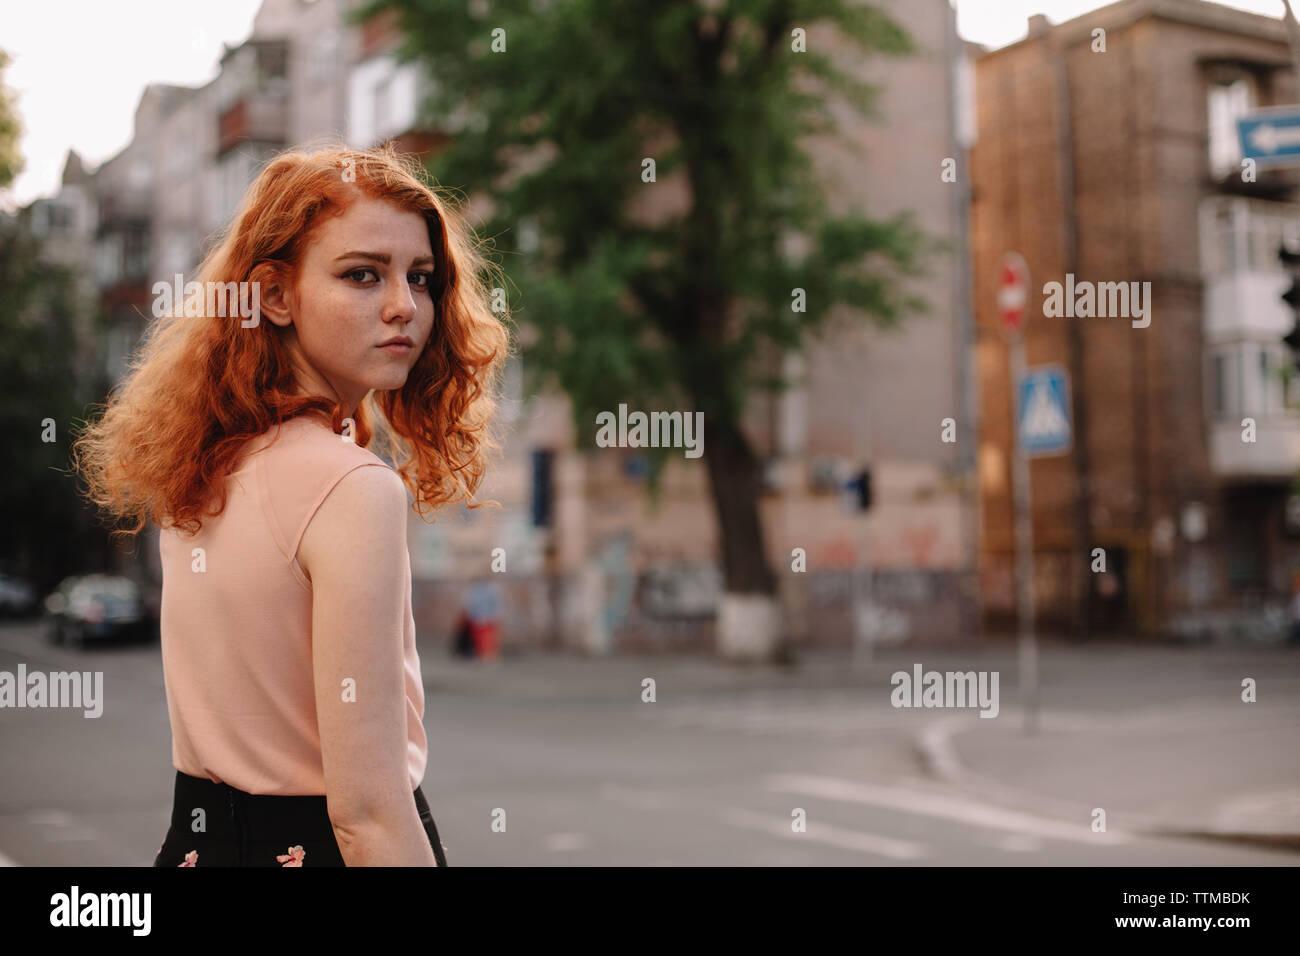 Jeune femme rousse walking in city street Banque D'Images